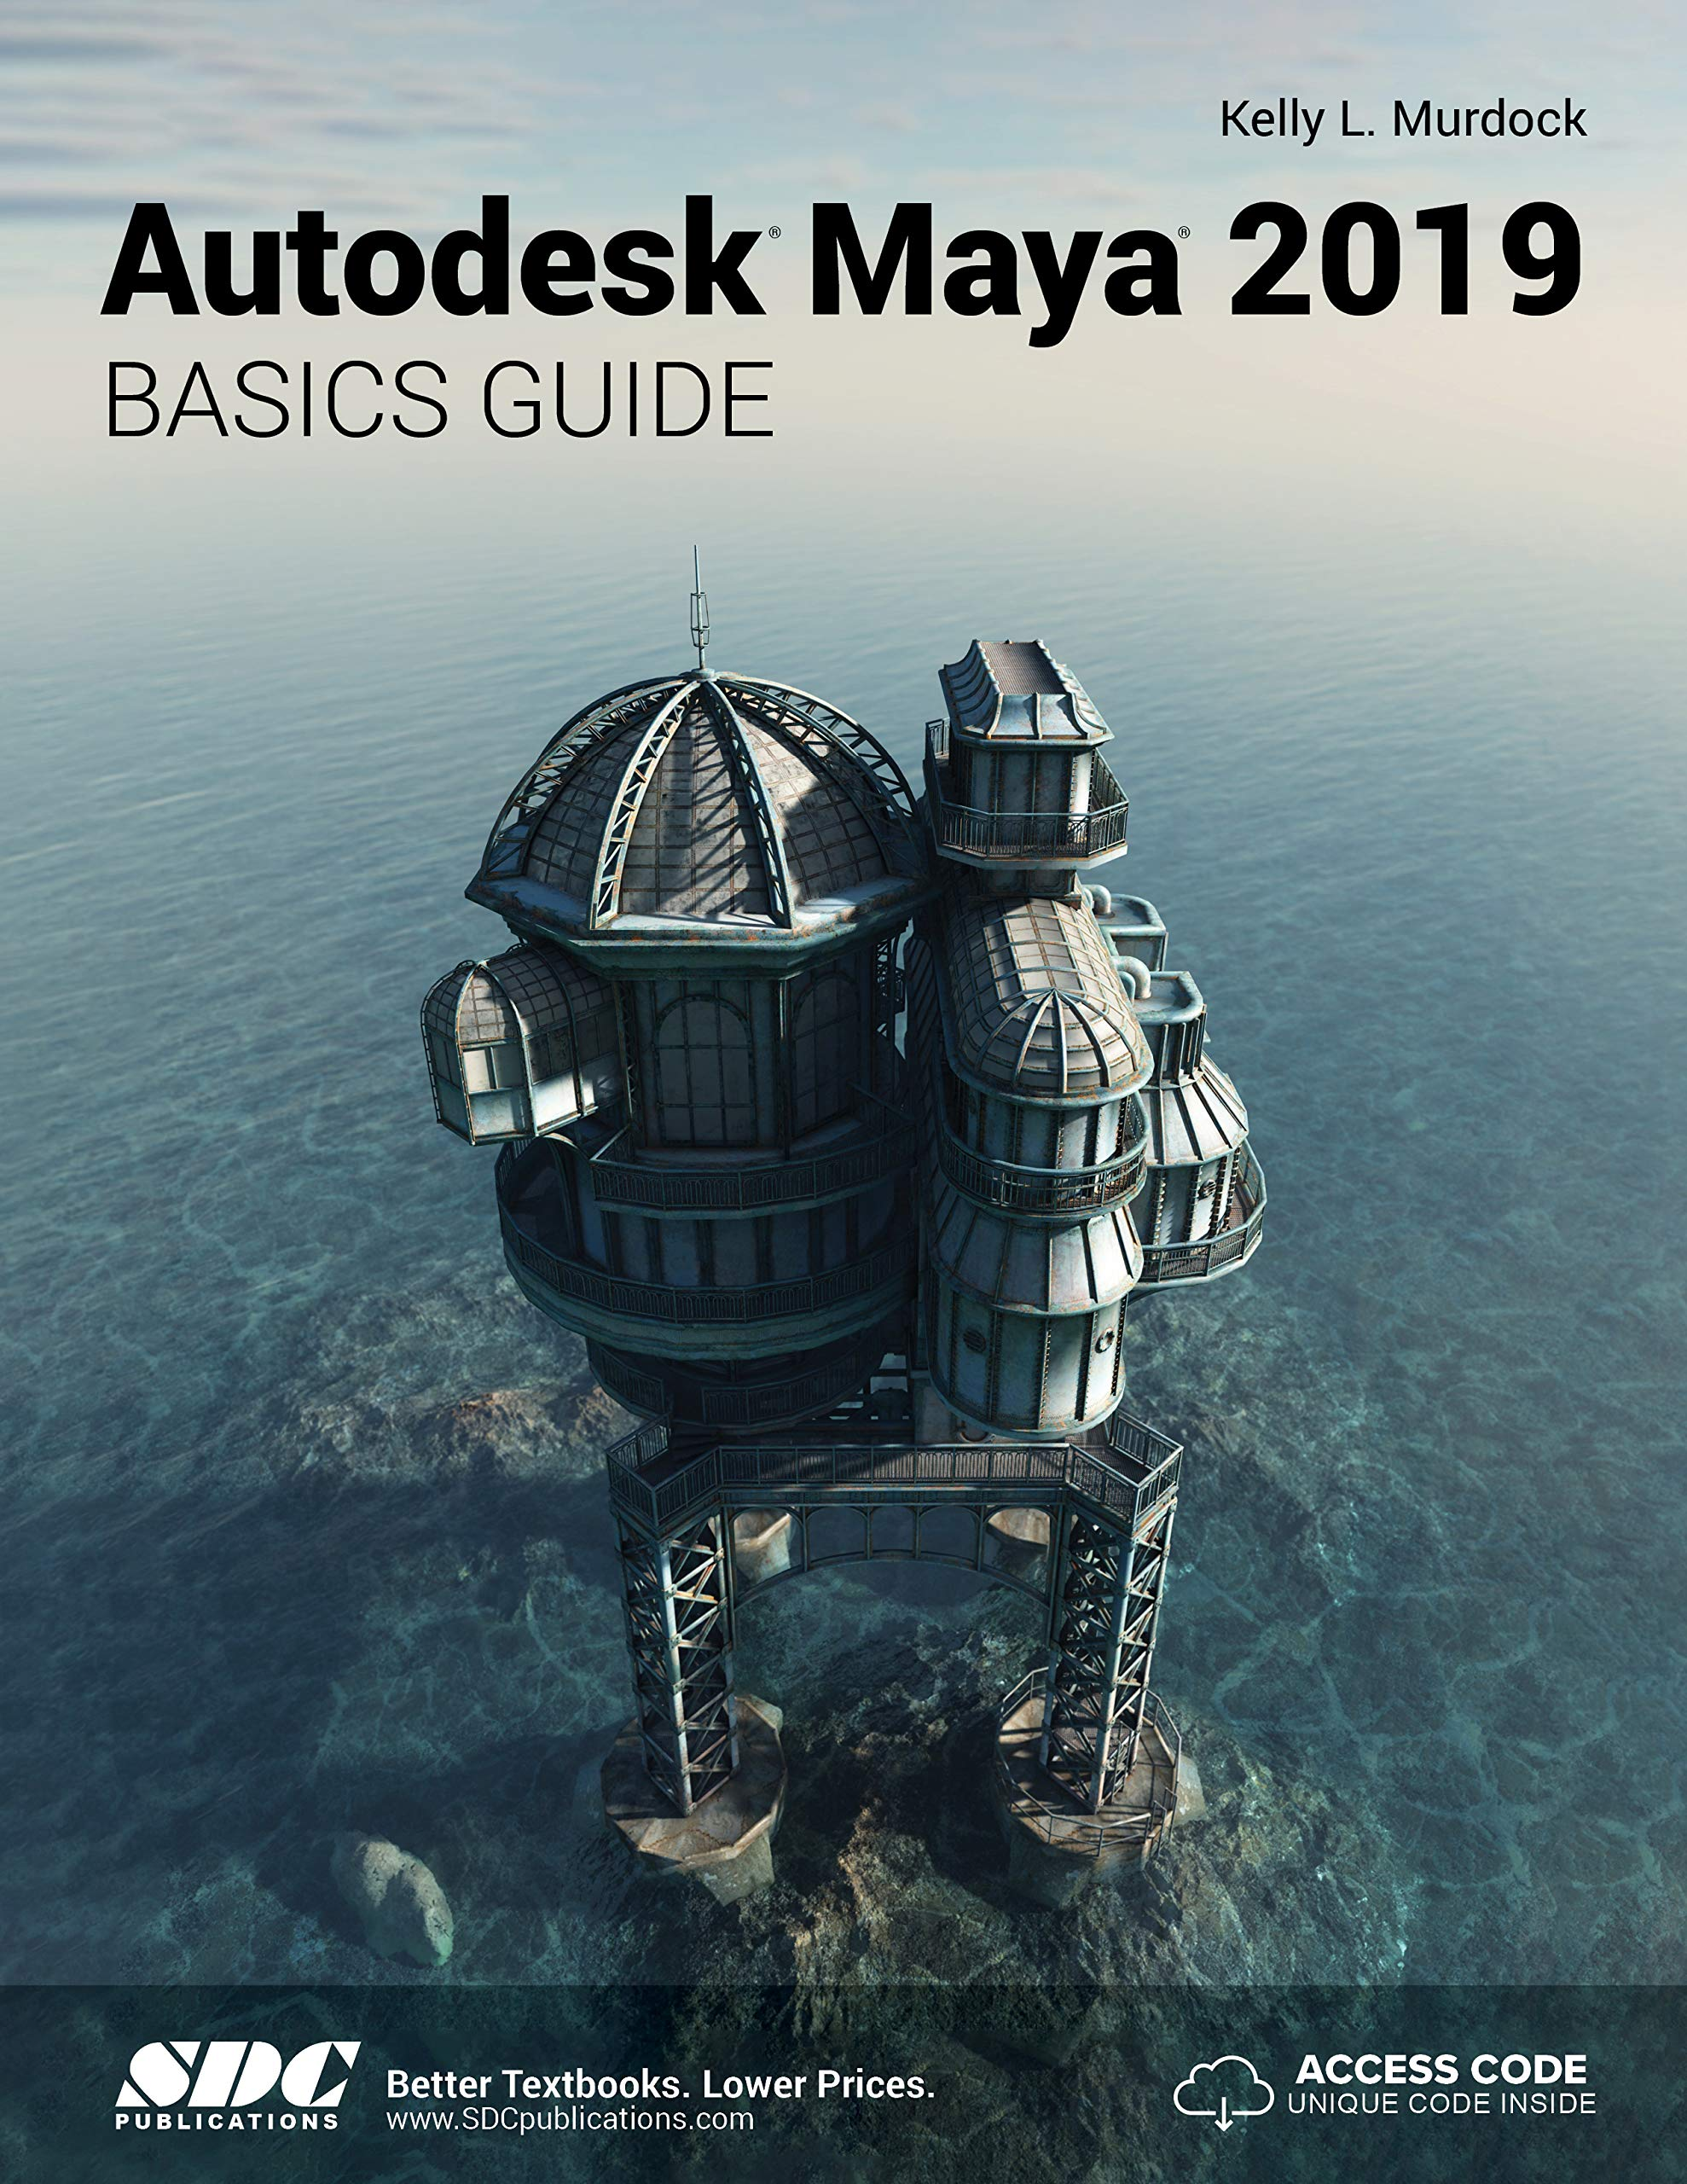 Autodesk Maya 2019 Basics Guide: Kelly Murdock